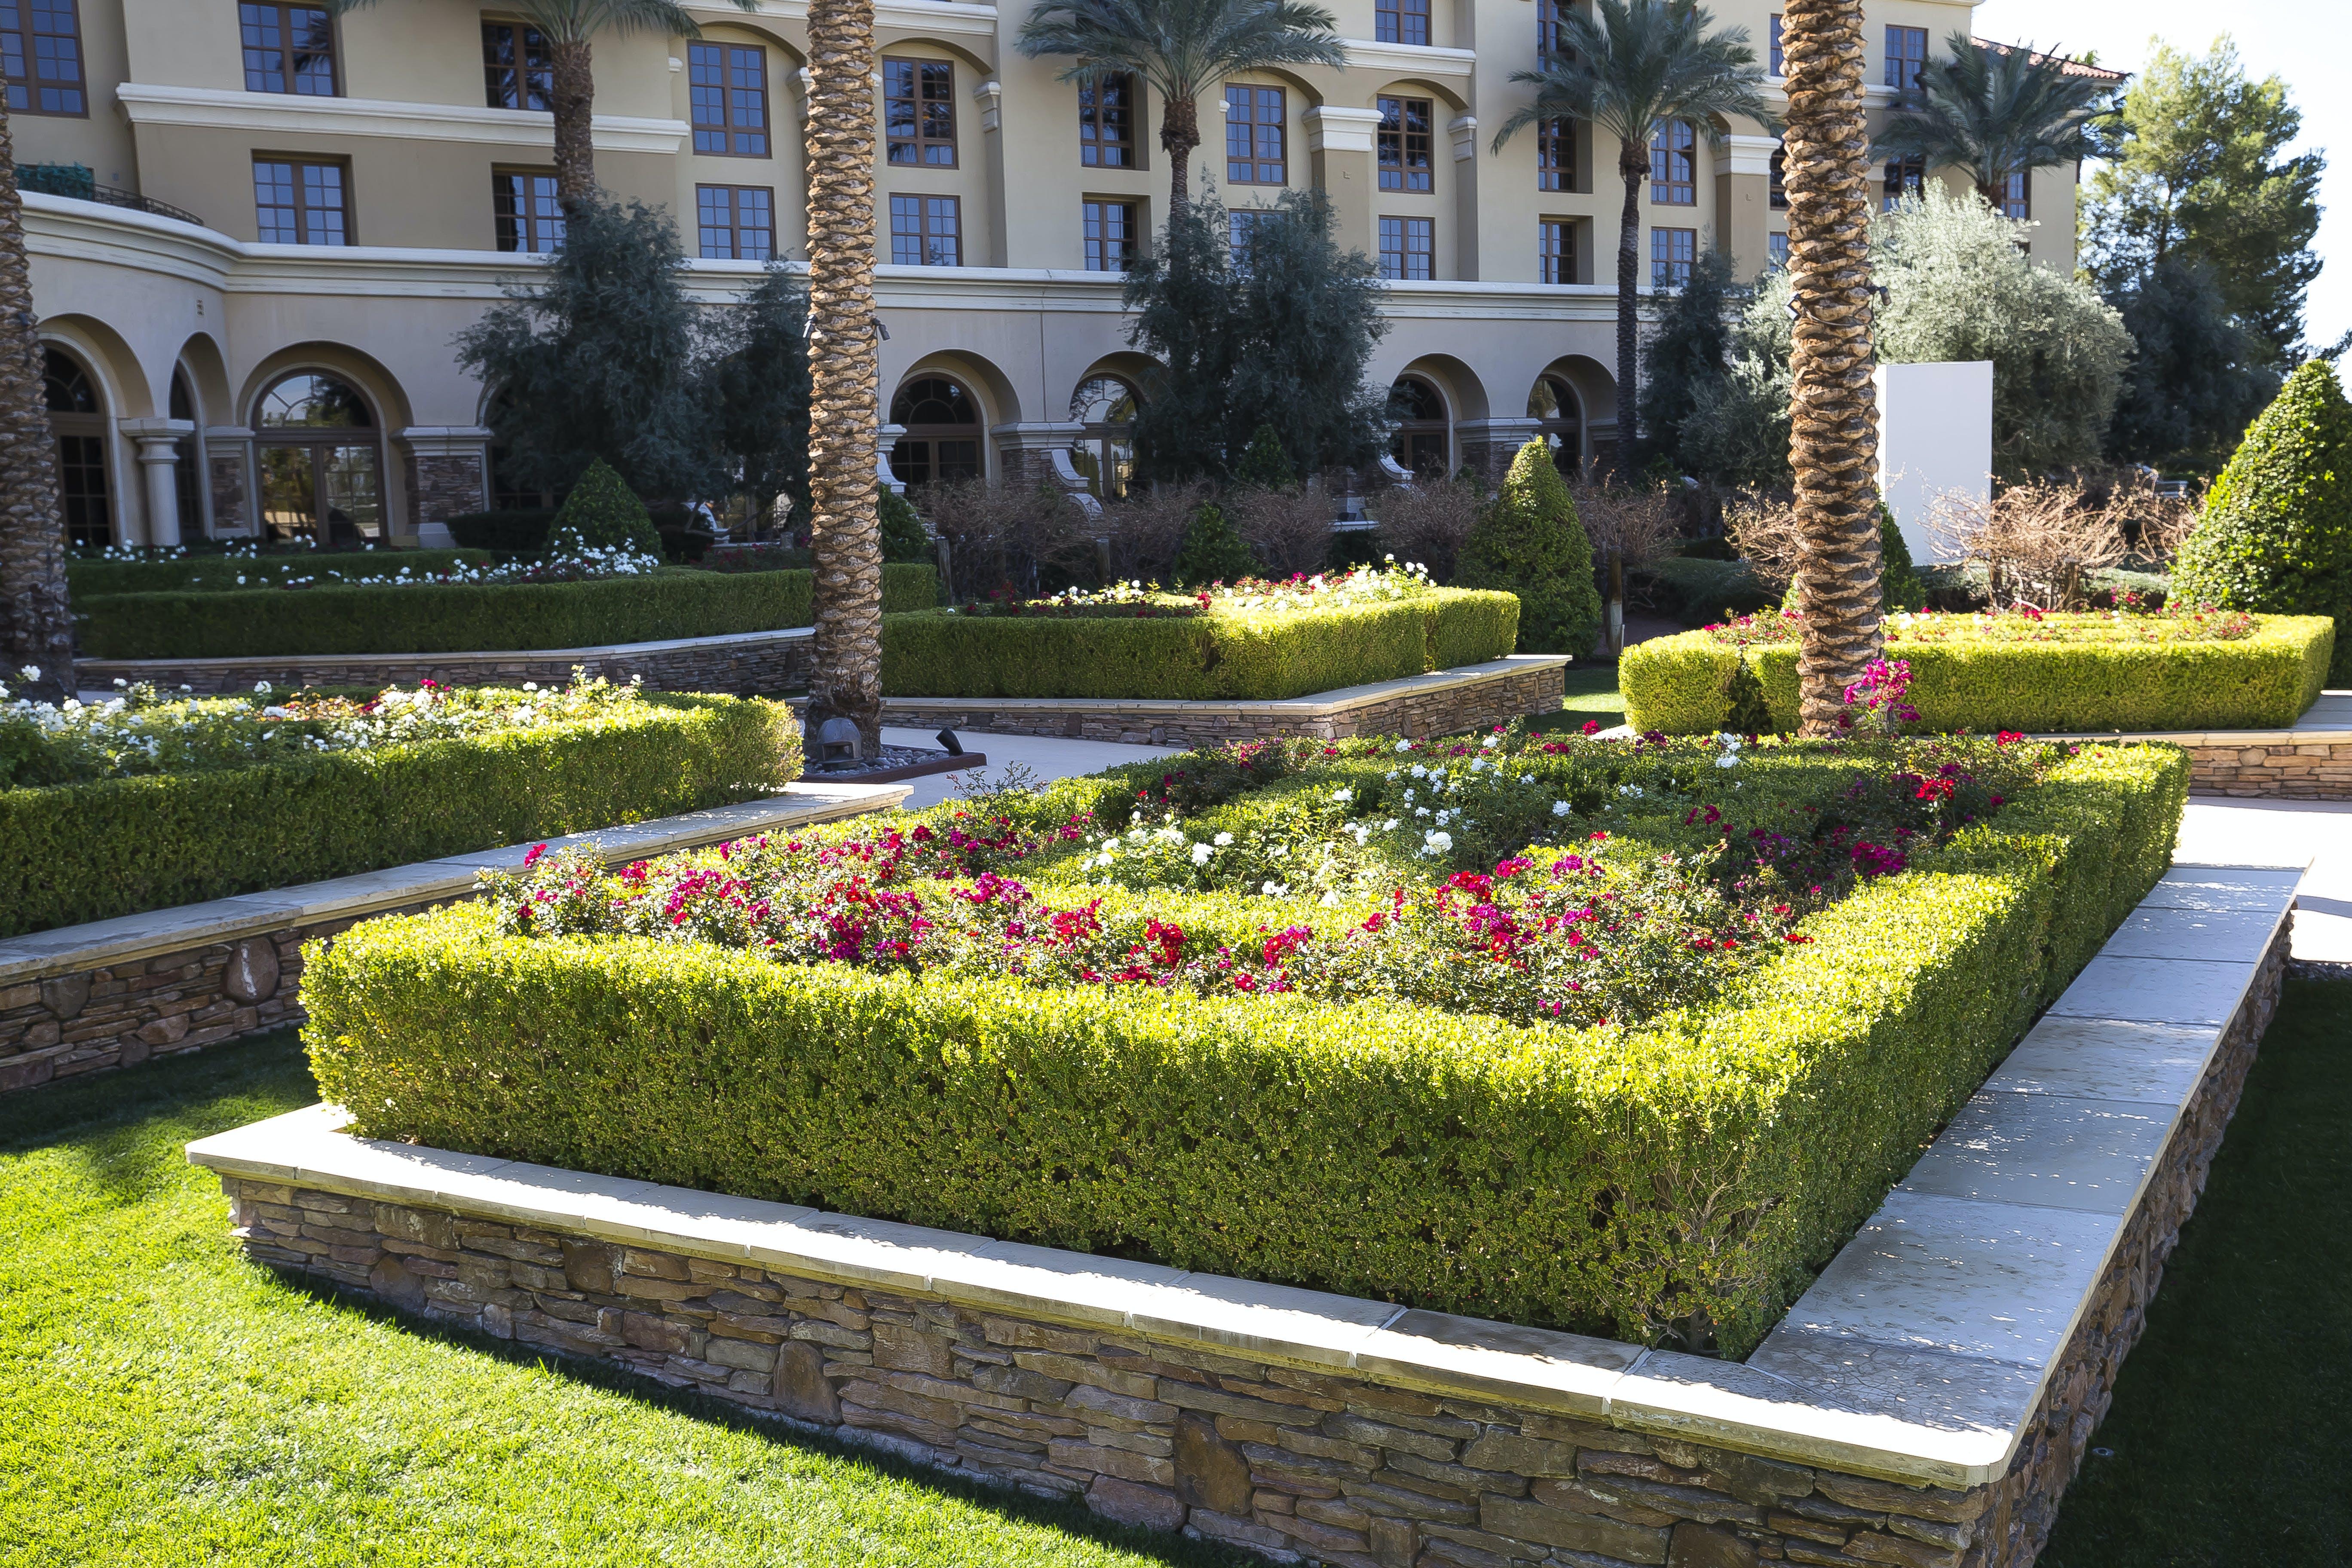 Free stock photo of Green valley ranch resort, hotel, hotel resort, resort